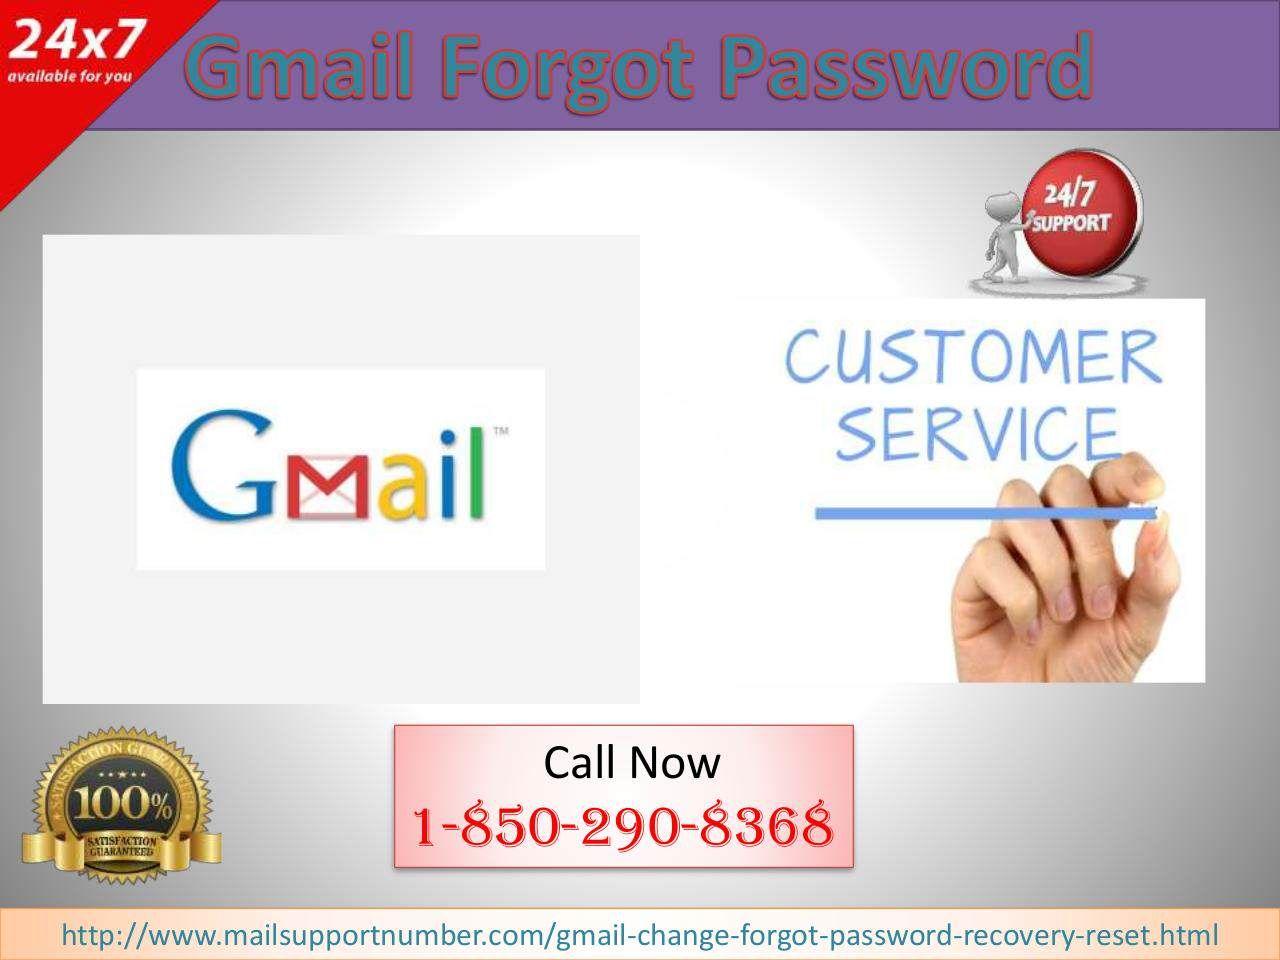 Our website forgot password